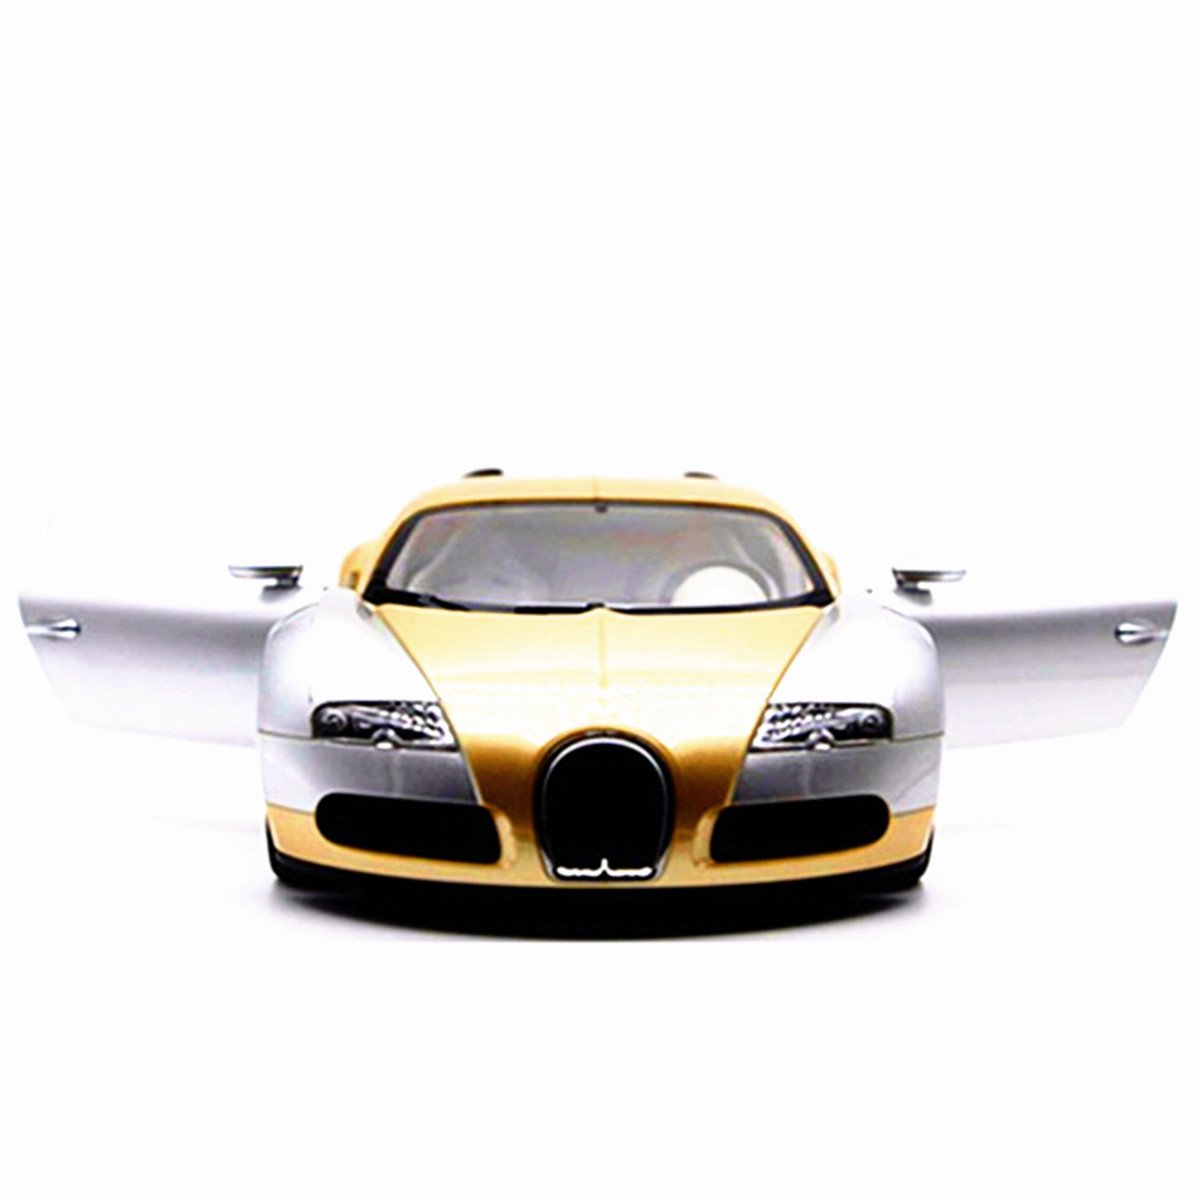 Bugatti Veyron Super Sport Need For Sd Movie on